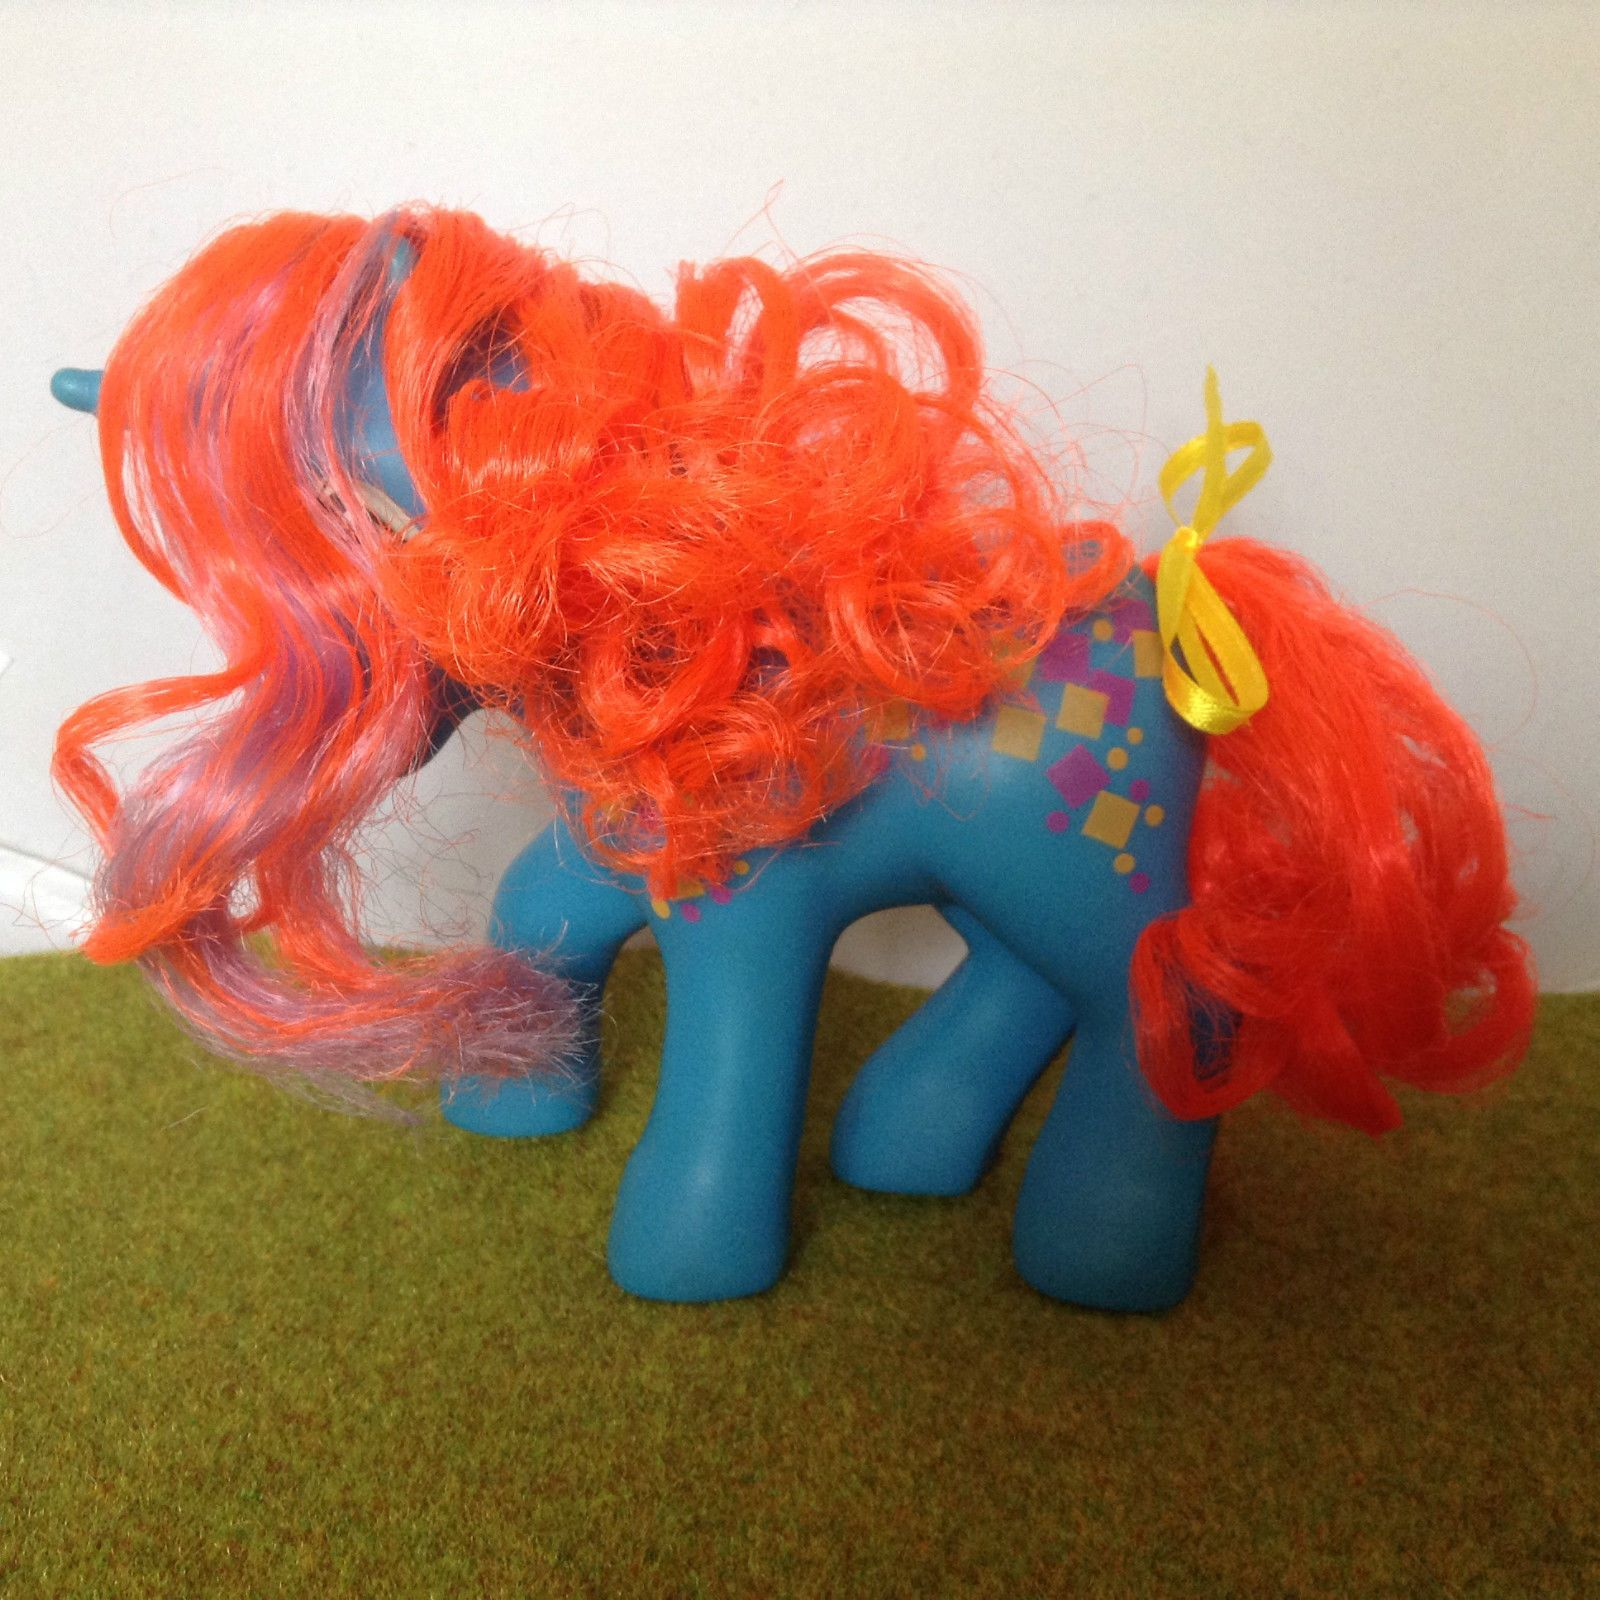 My Little Pony / G1 / Rockin' Beat Ponies / Tunefull / Melody / 1990 | eBay